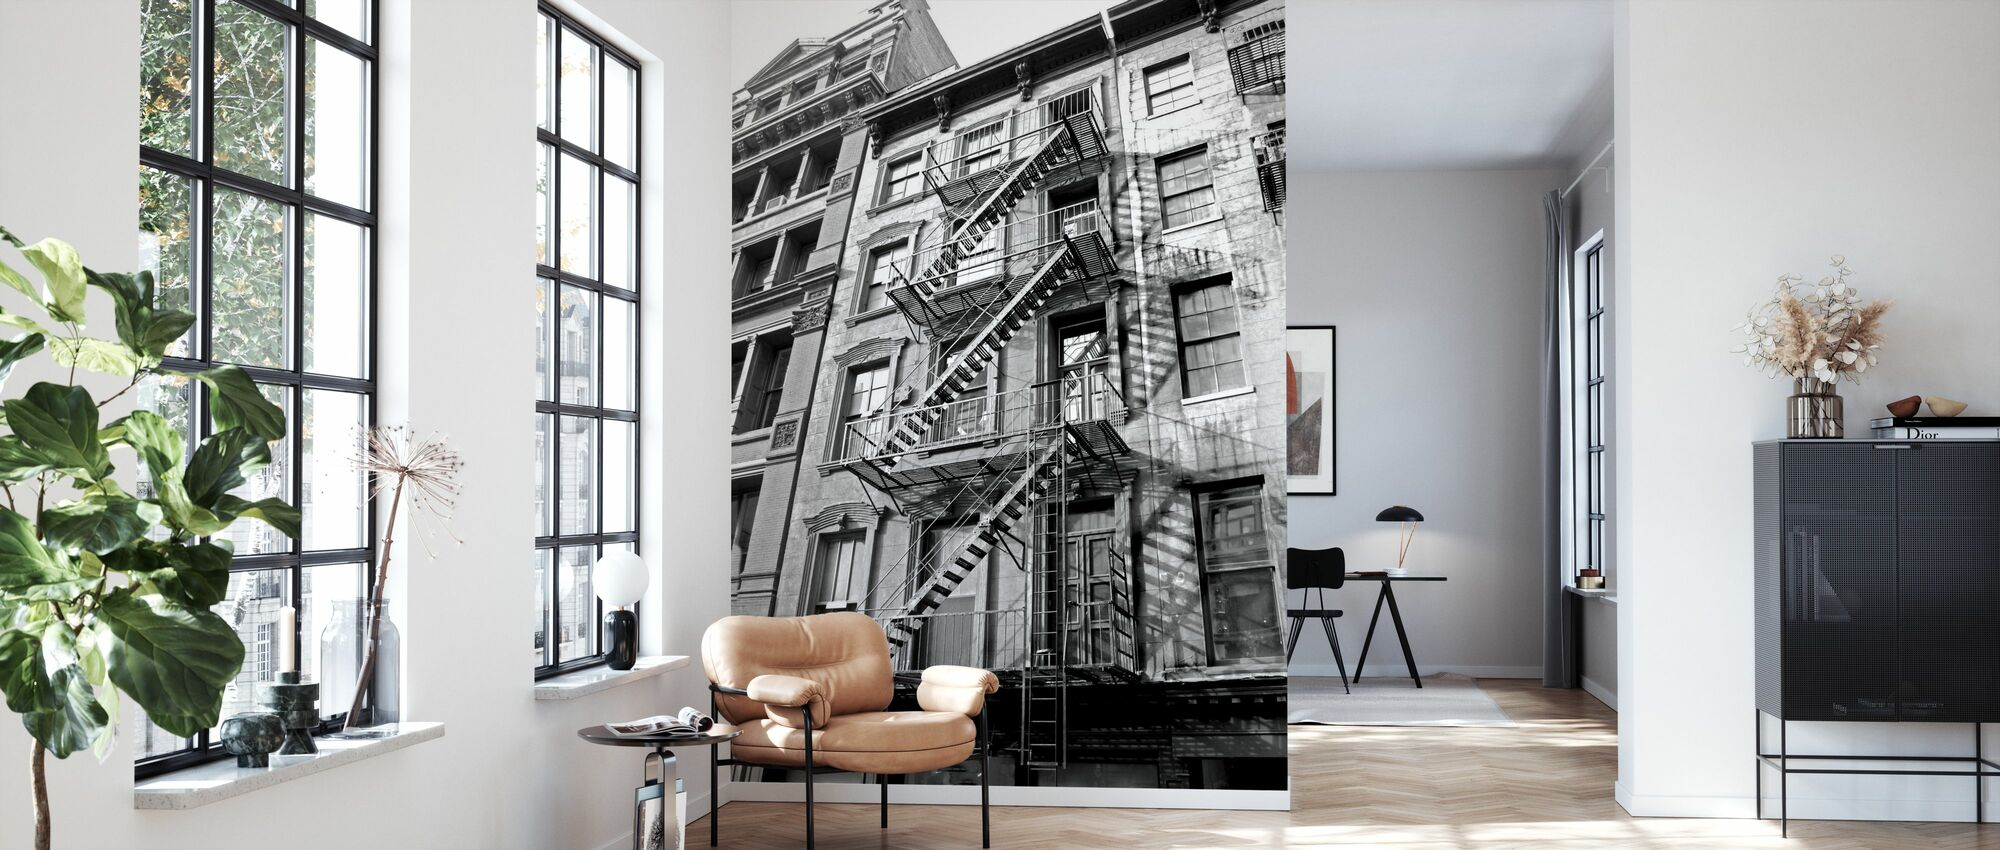 New York City - Fire Escape - Wallpaper - Living Room